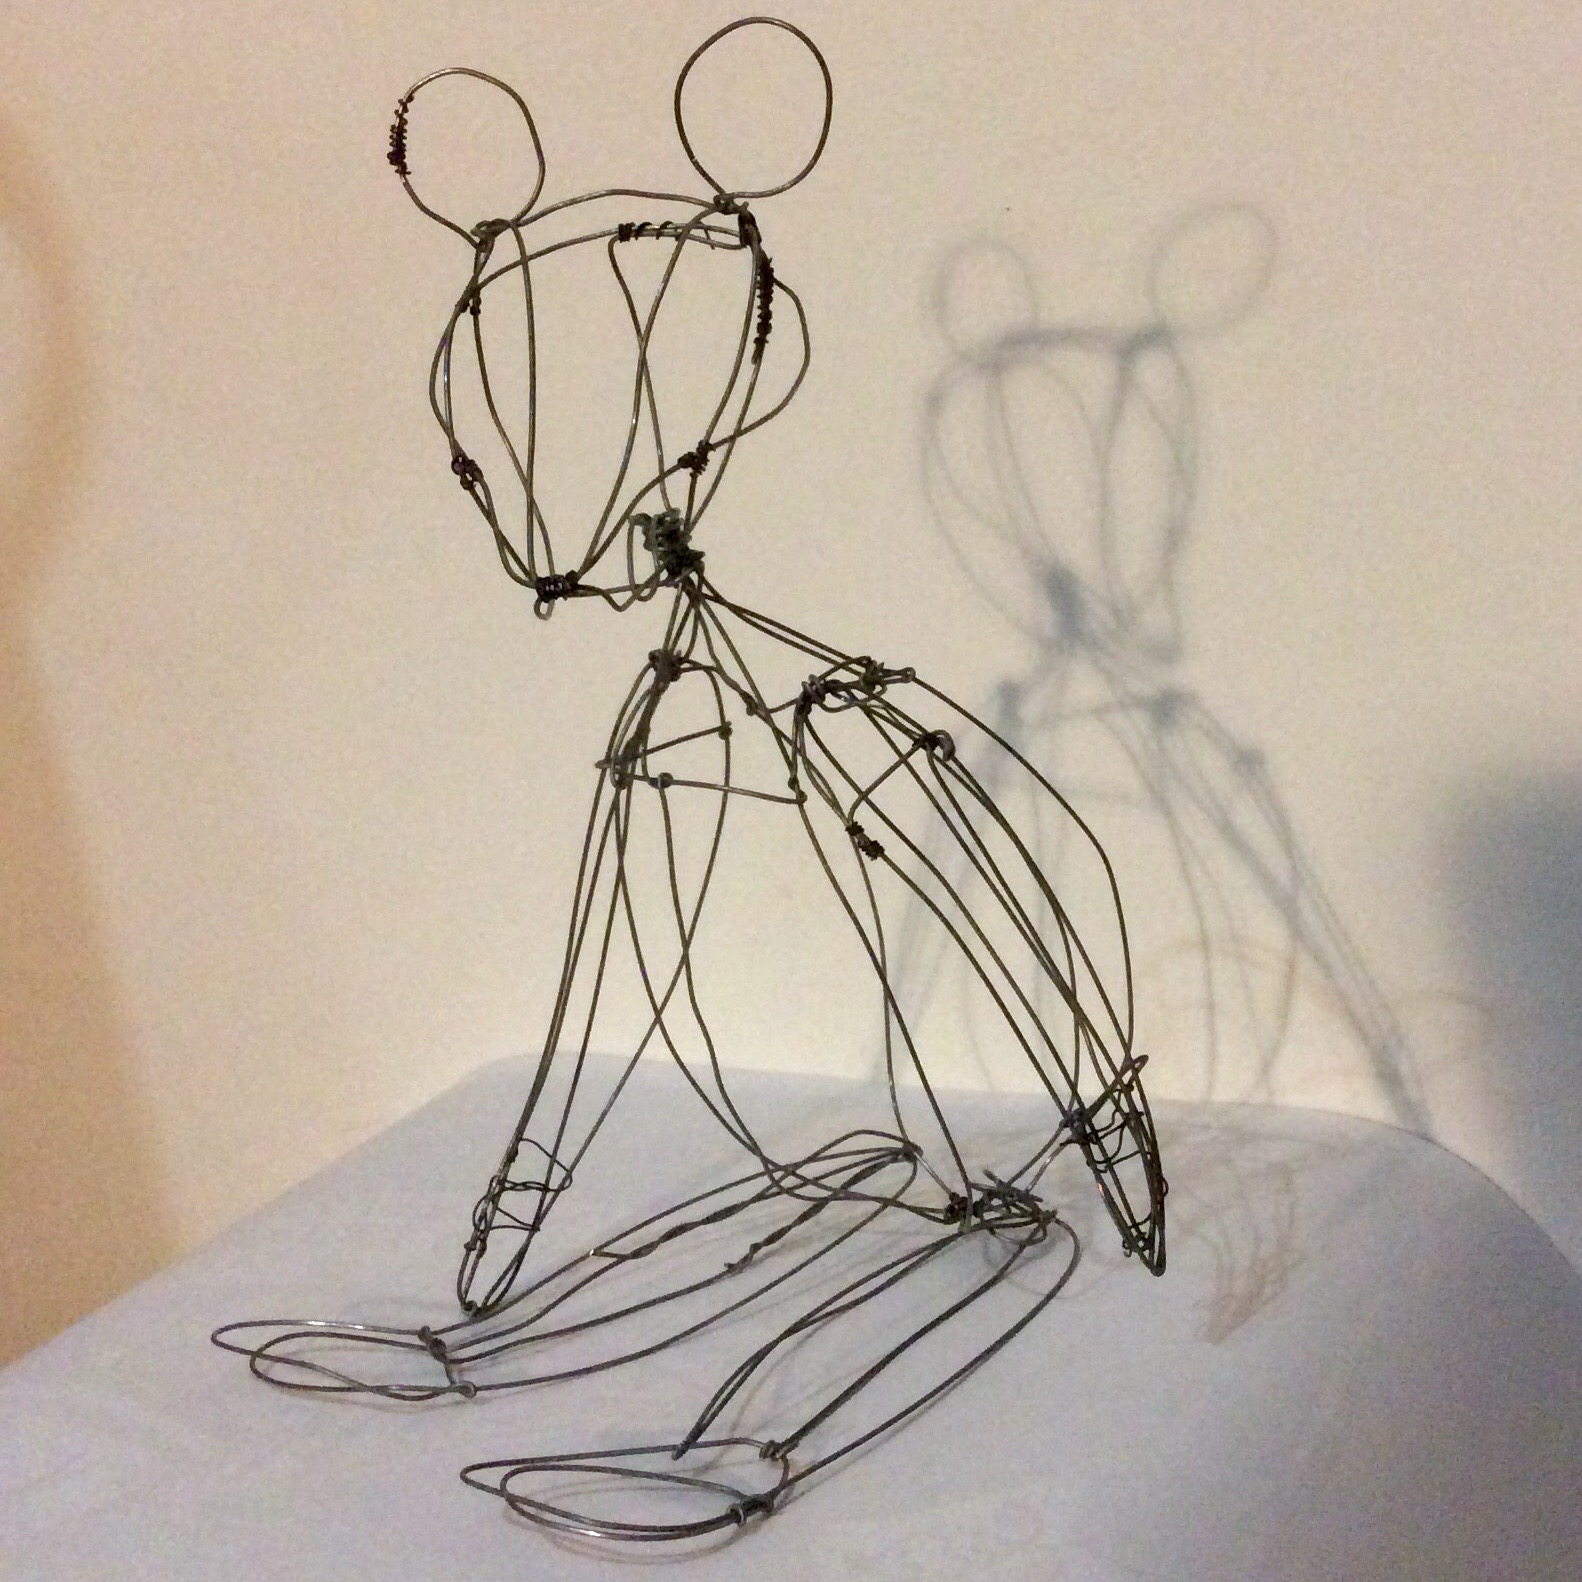 wire | macknifique art & design